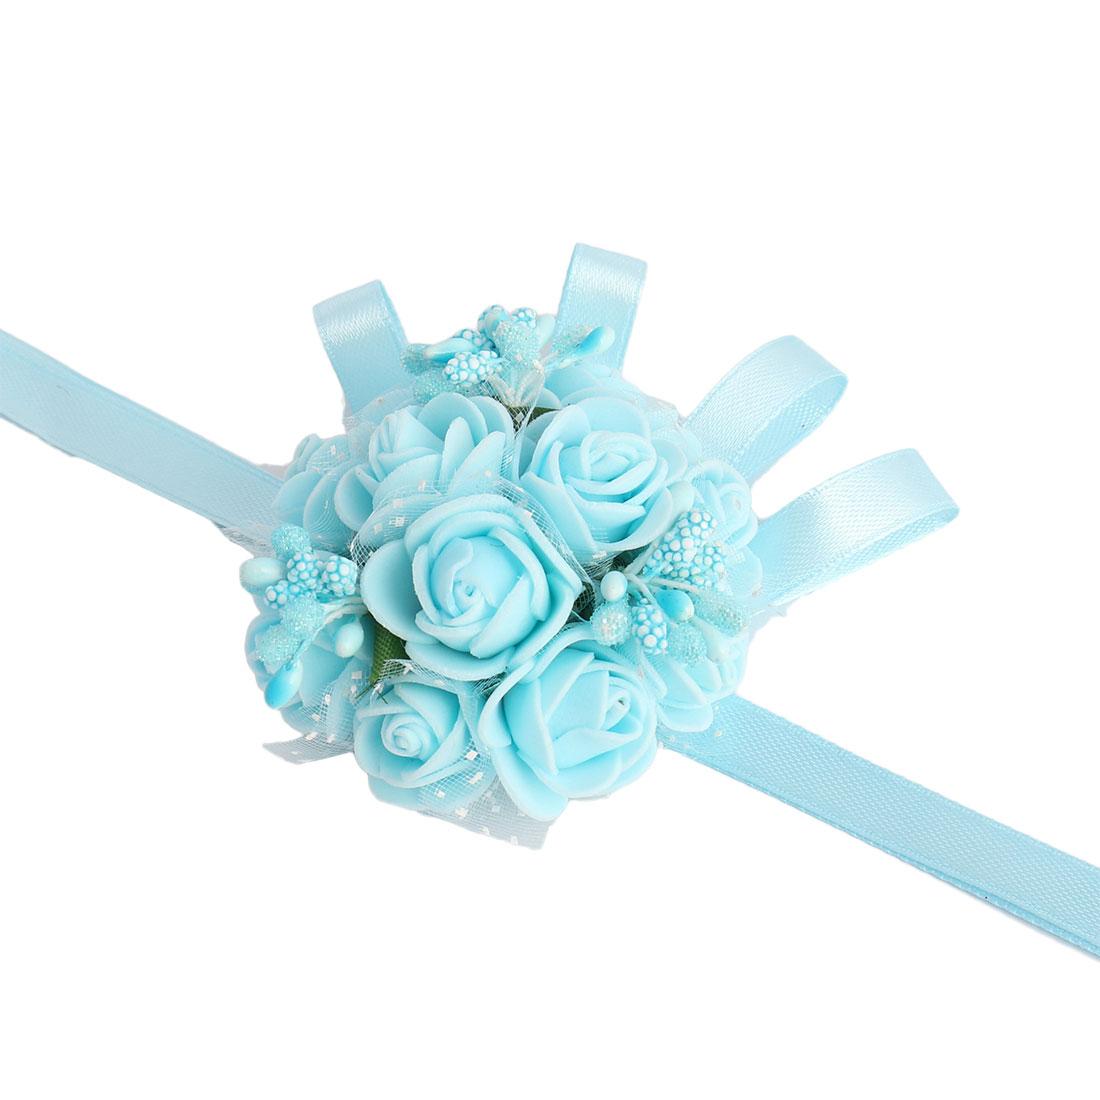 Party Prom Foam Rose Shaped Girl Hand Decor Artificial Wrist Flower Light Blue